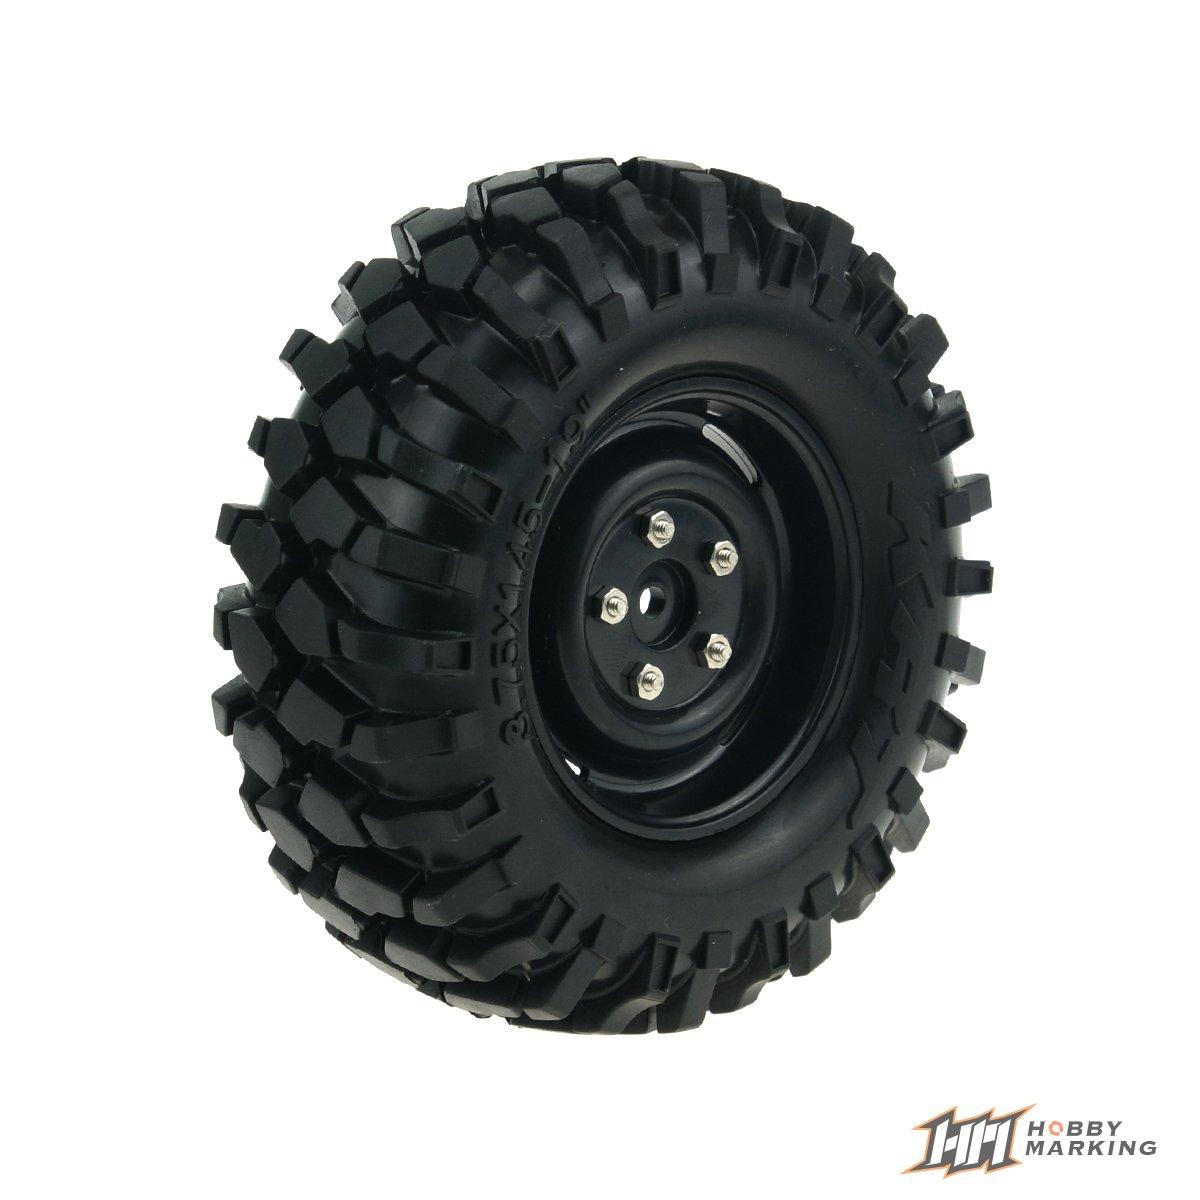 HobbyMarking 4Pcs RC 1//10 Car 1.9 Inch Plastic Wheel Hub and 96mm Tires Set for RC Crawler Axial SCX10 D90 RC4WD TAMIYA CC01